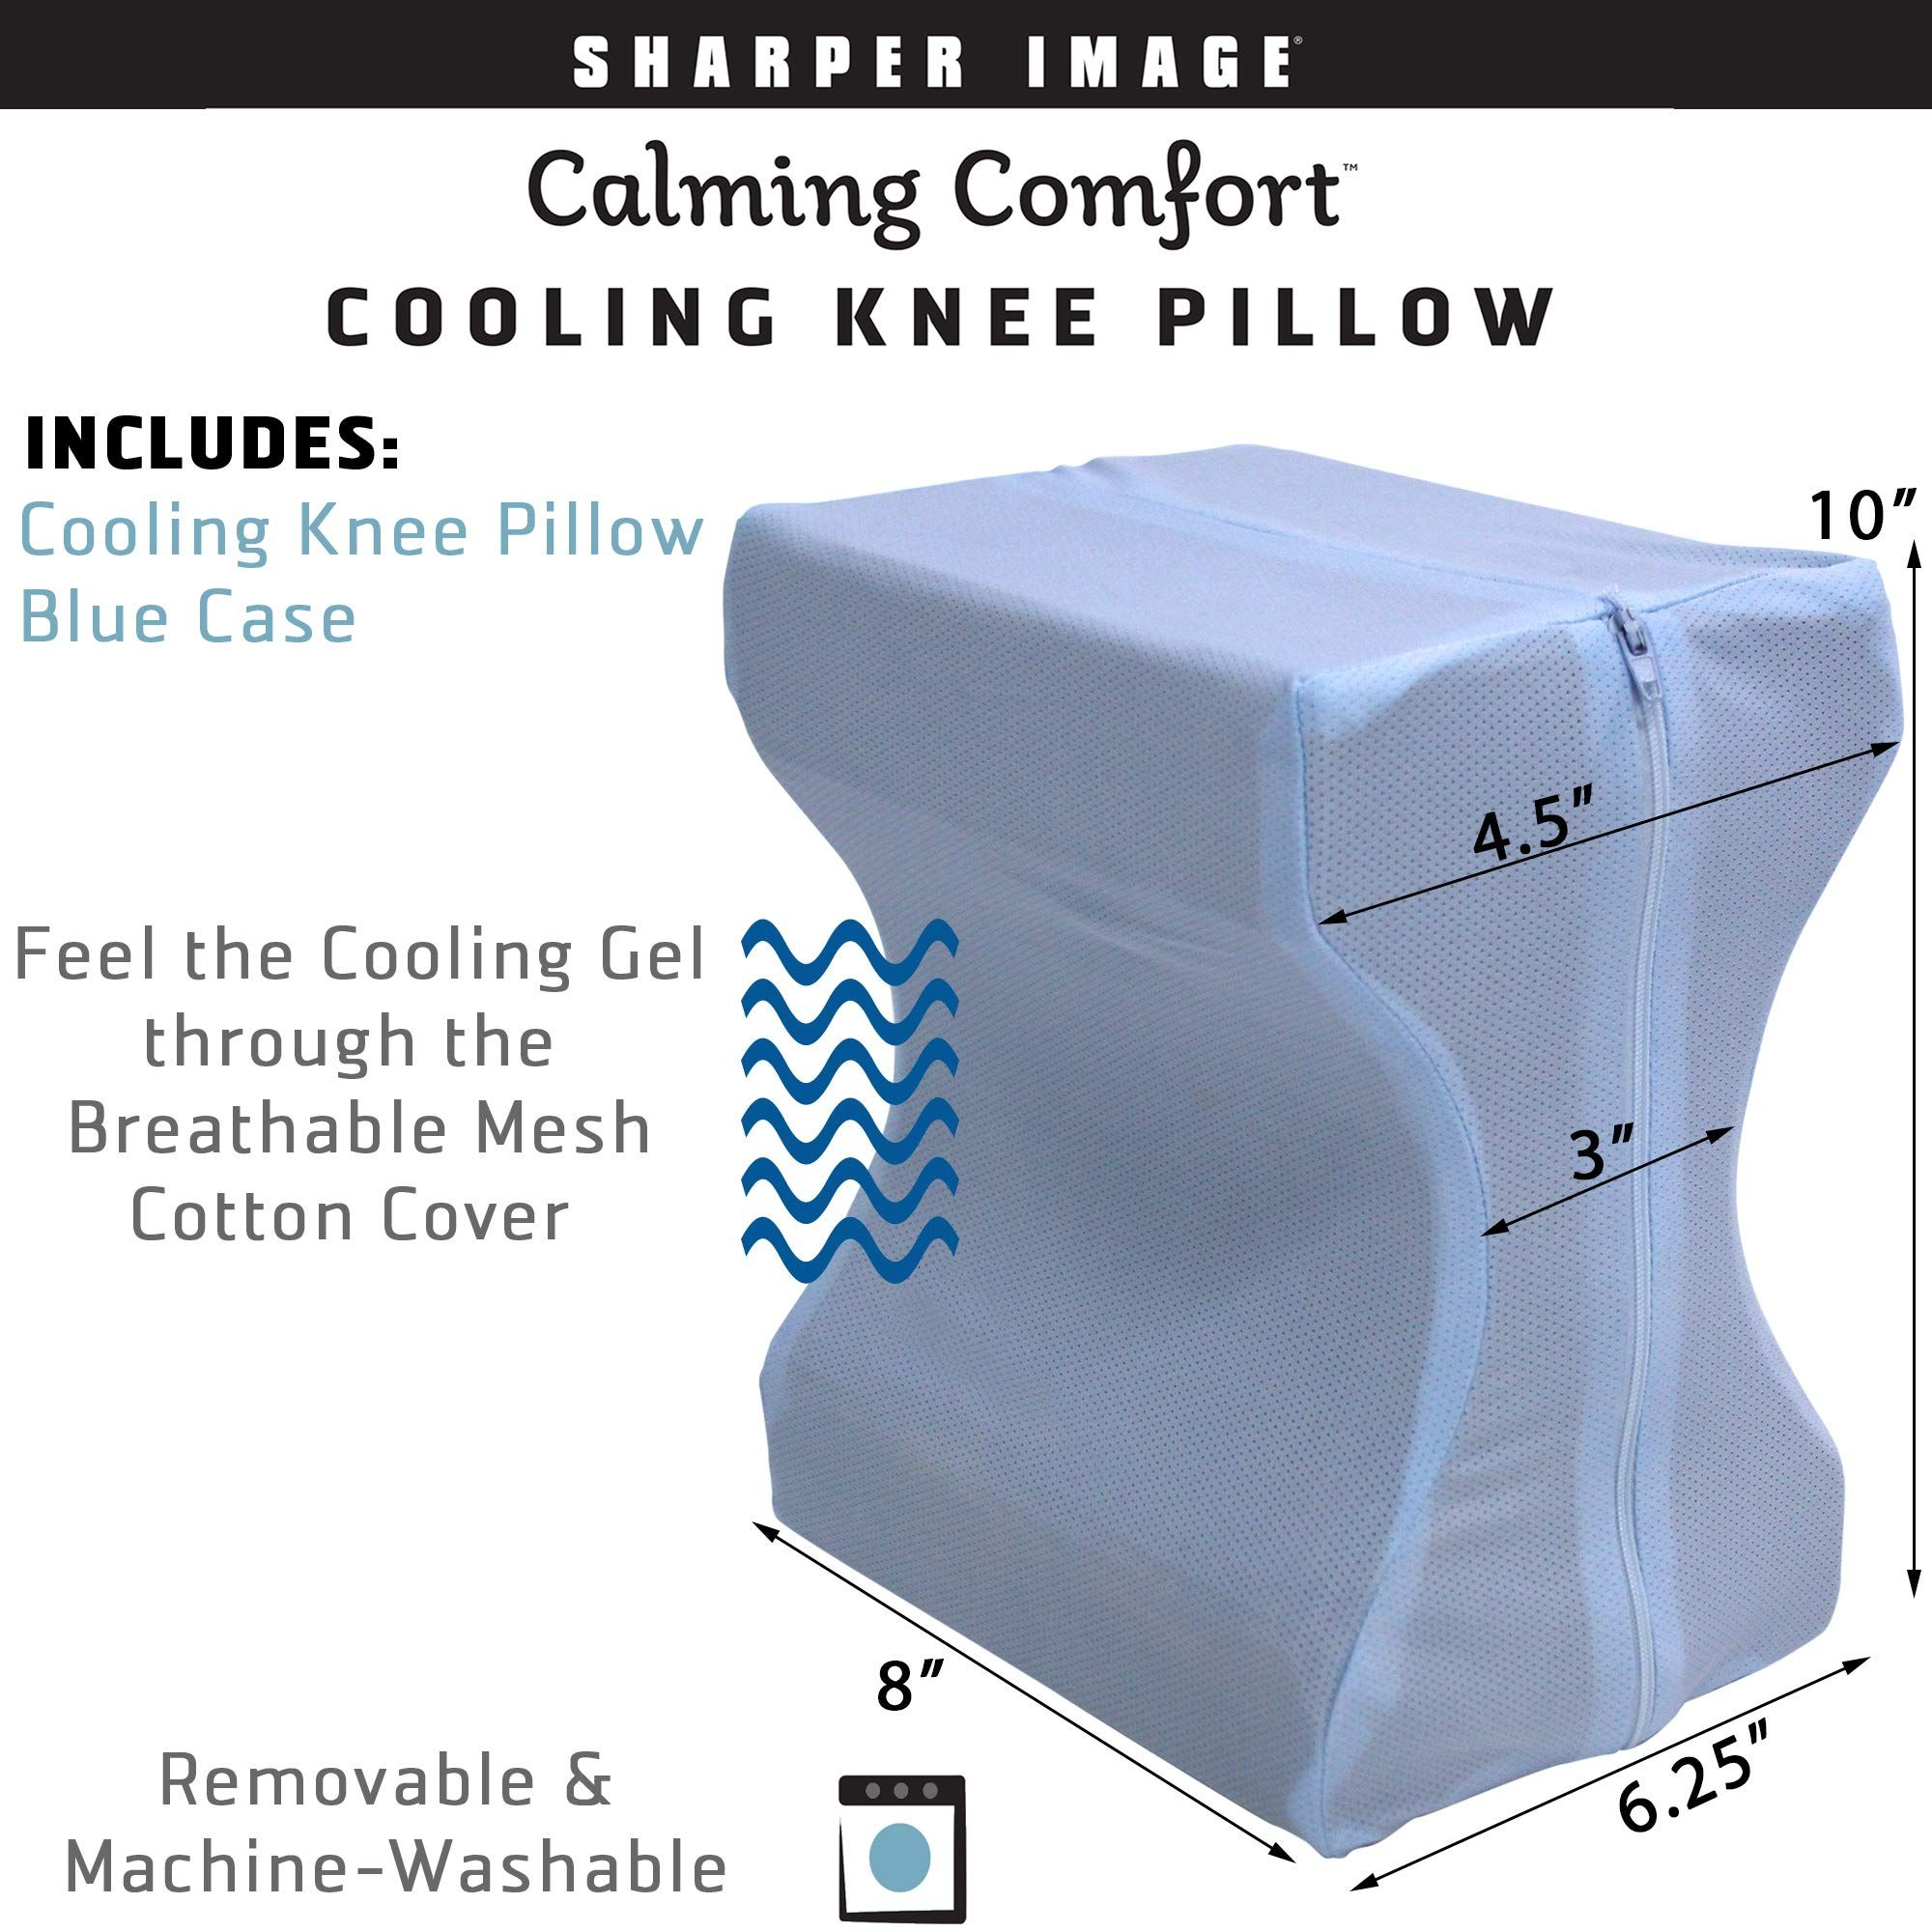 Calming Comfort Cooling Knee Pillow By Sharper Image Memory Foam